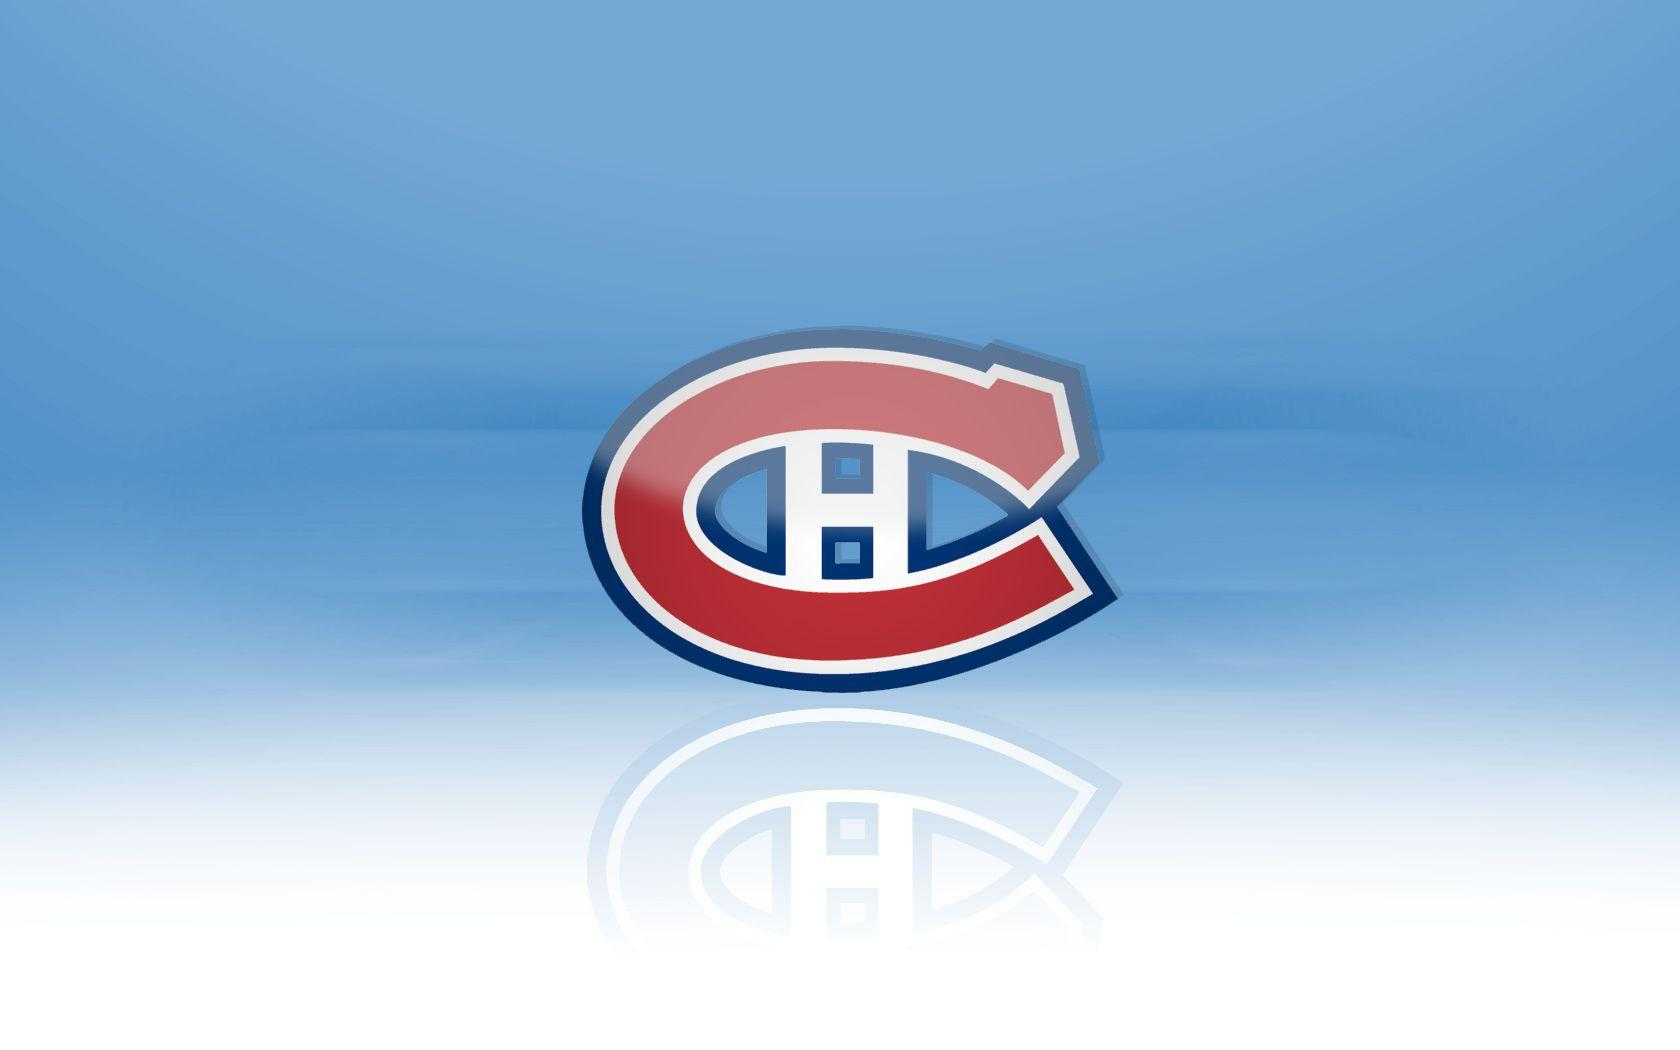 Carey price wallpapers montreal habs montreal hockey 9 html code - Carey Price Montreal Canadiens Wallpaper Hockey B